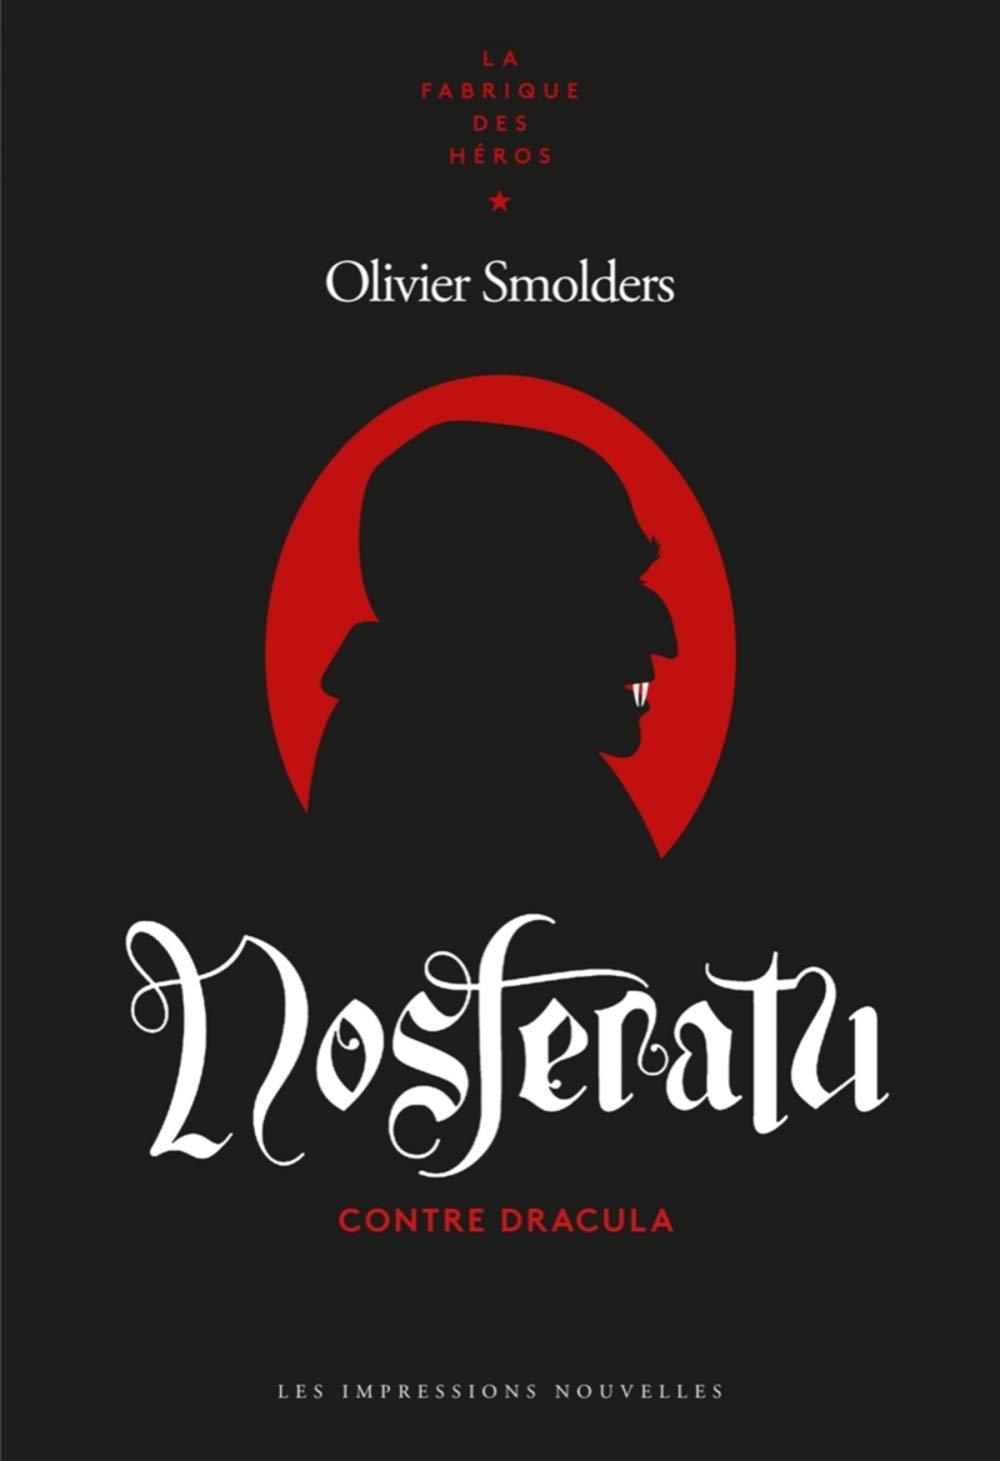 Nosferatu contre Dracula d'Olivier Smolders une lecture sanglante